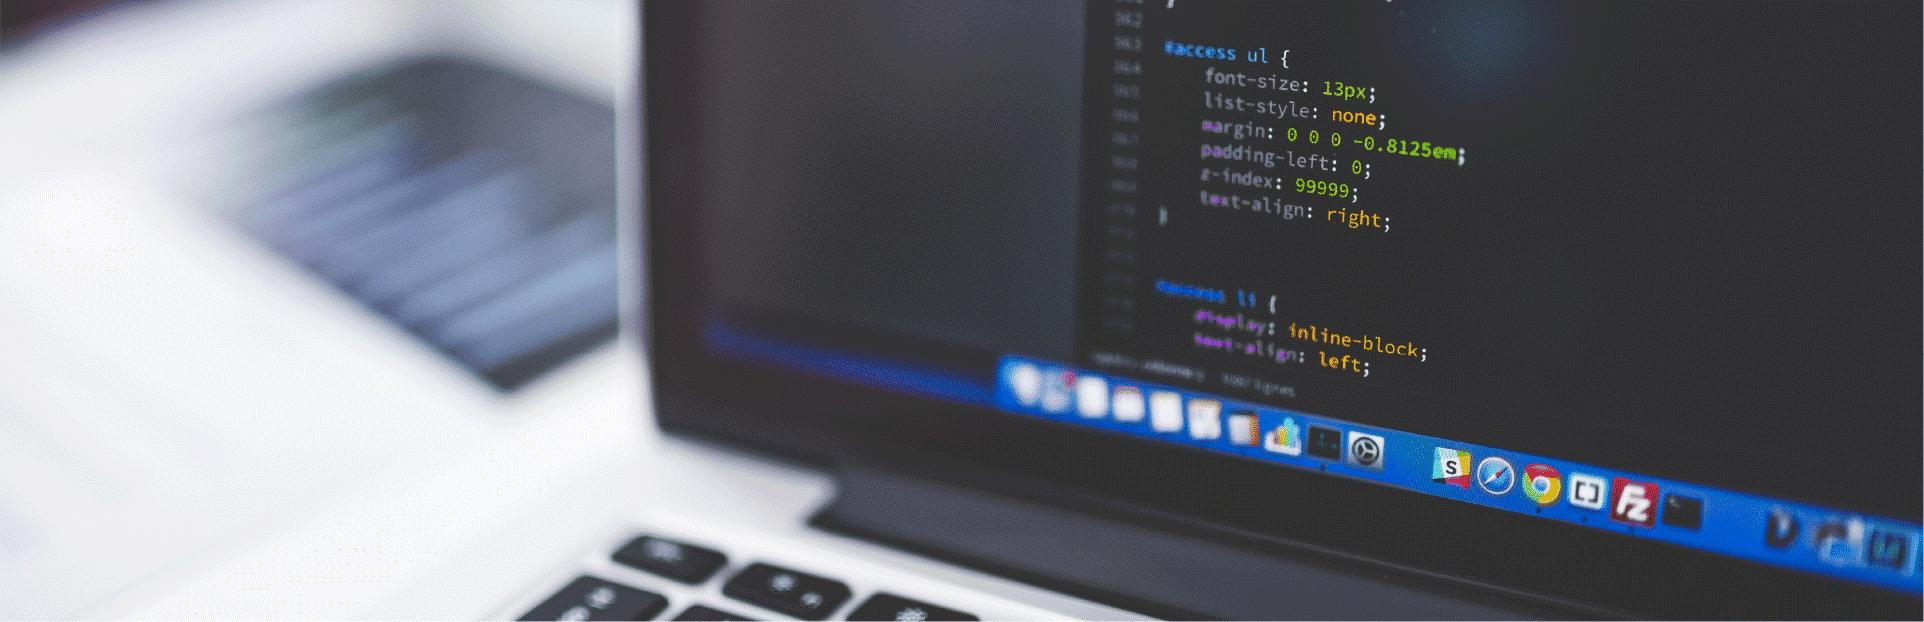 LTTR-Web-Development